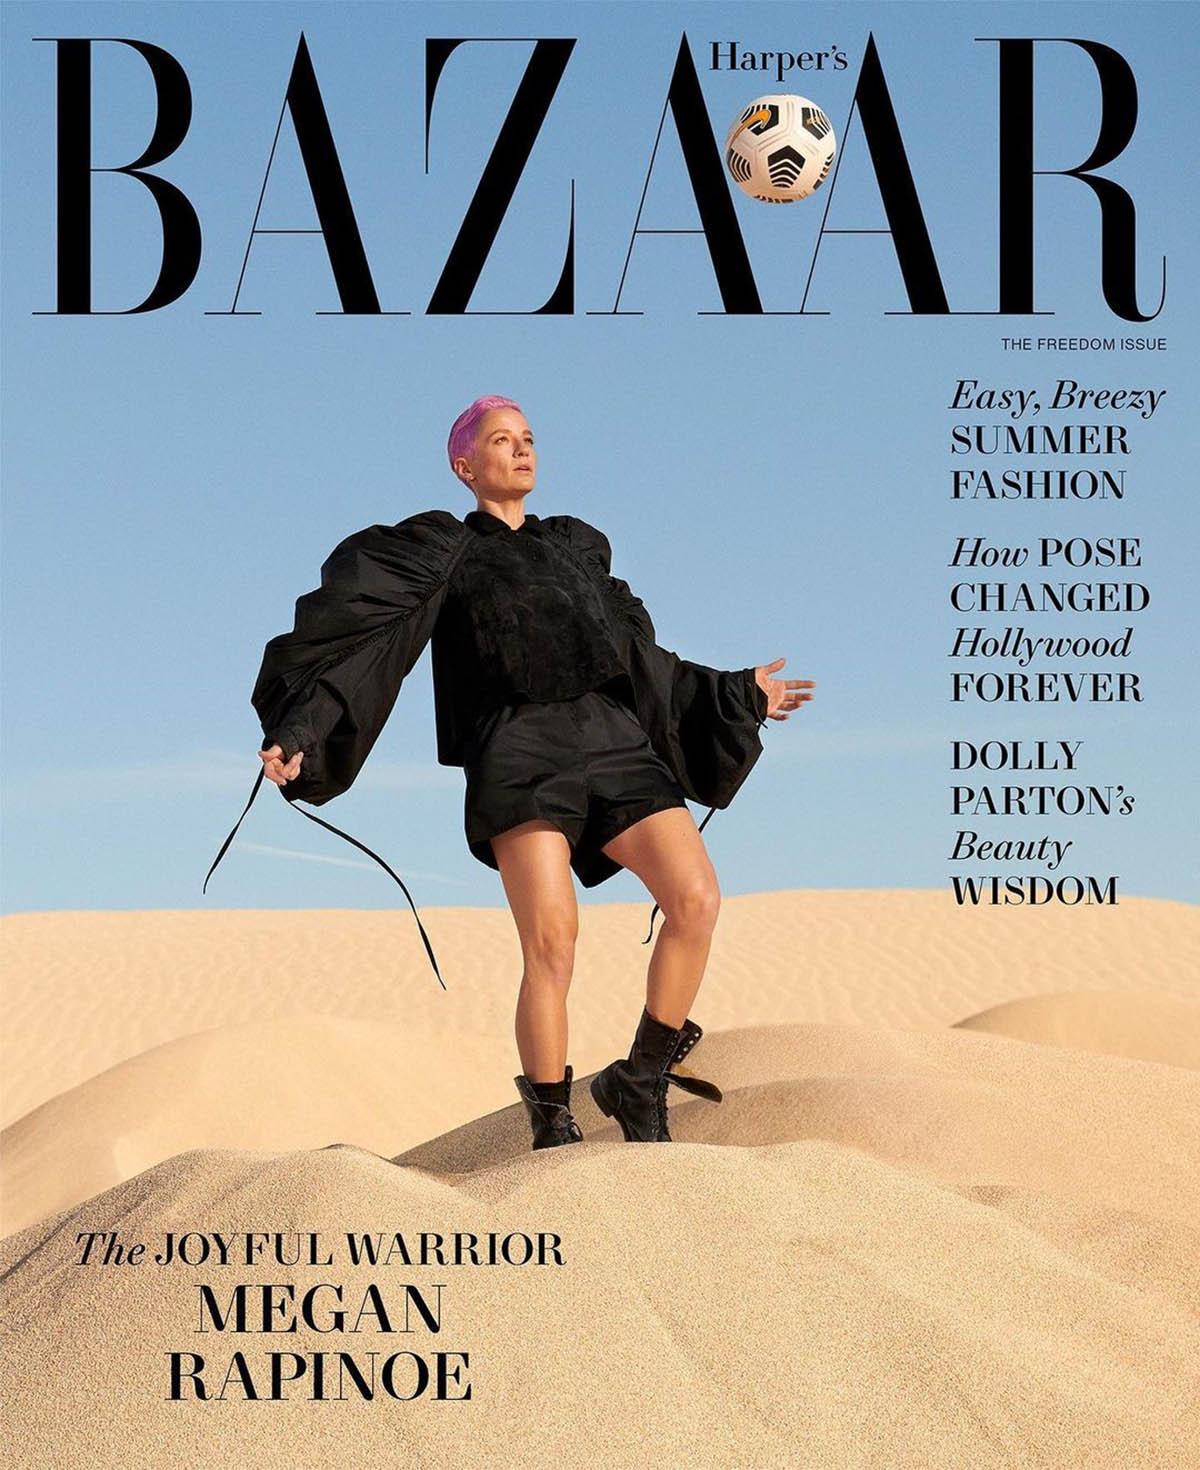 Megan Rapinoe covers Harper's Bazaar US June July 2021 by Ryan McGinley